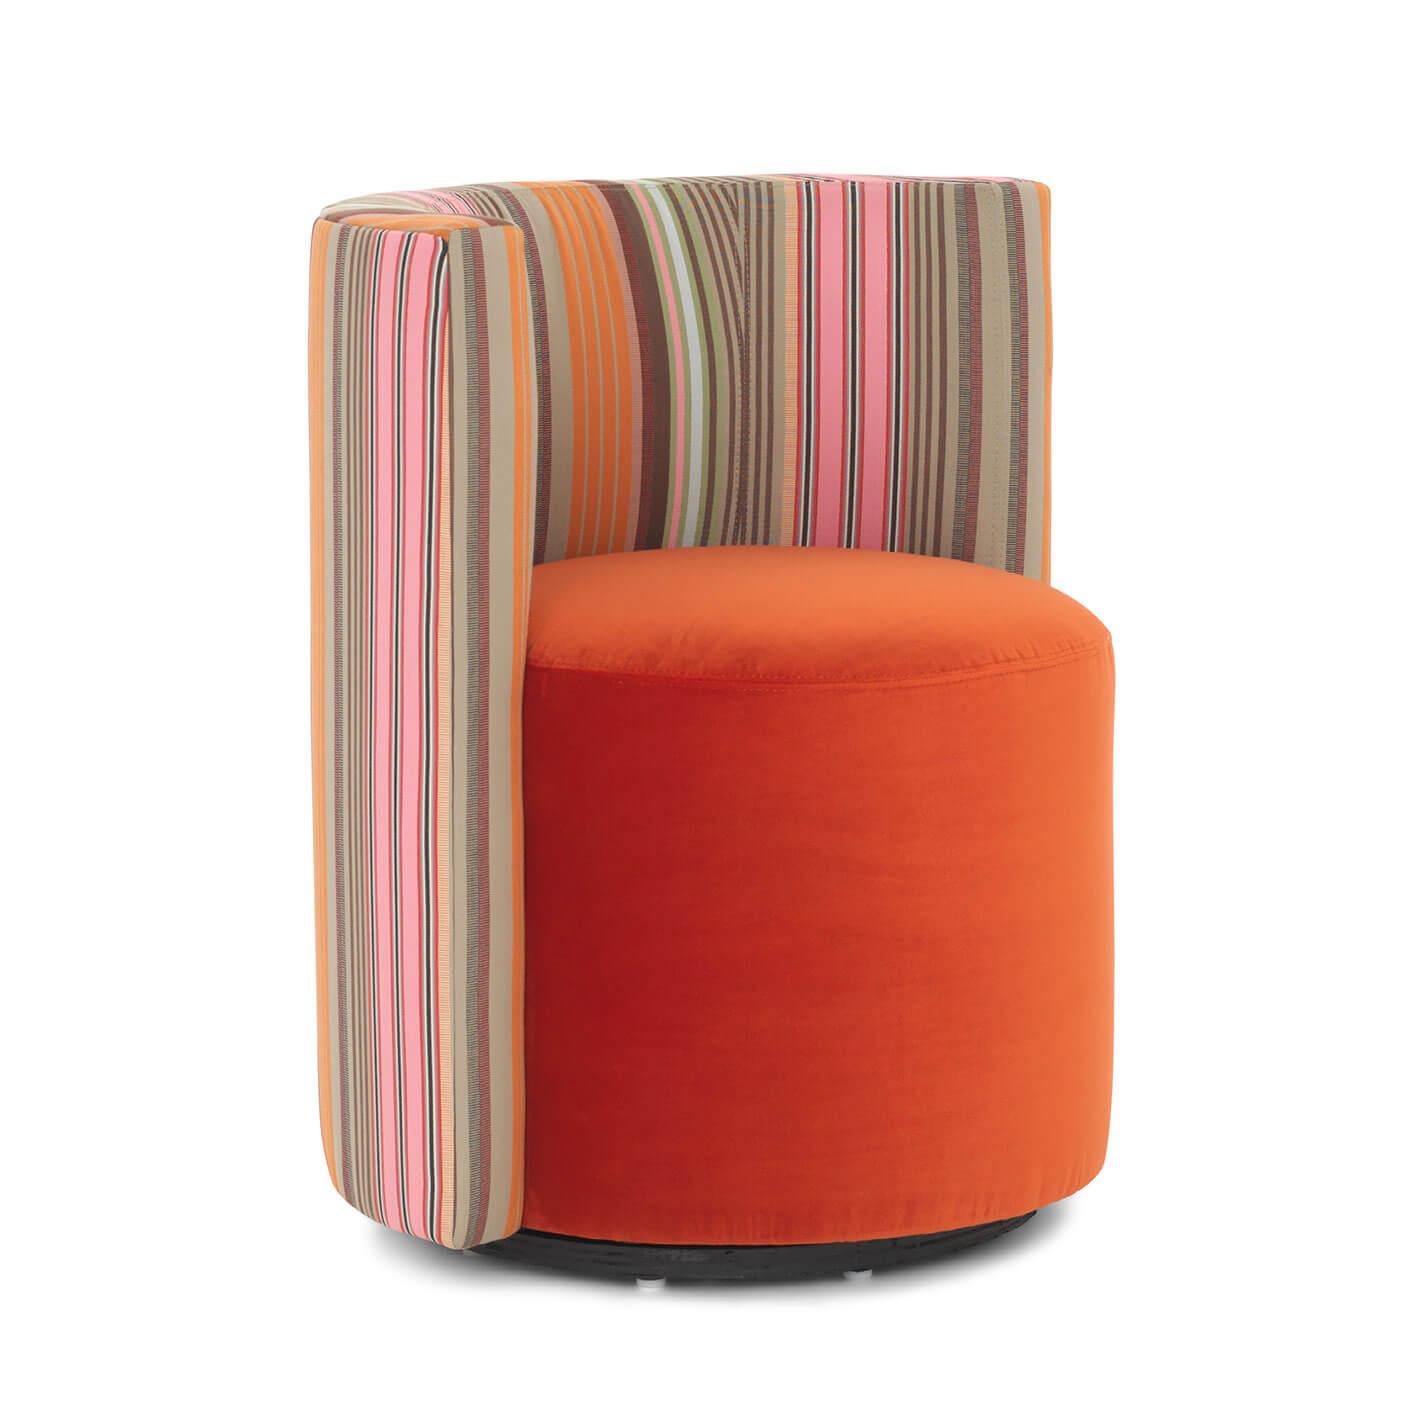 Poppy Swivel Chair